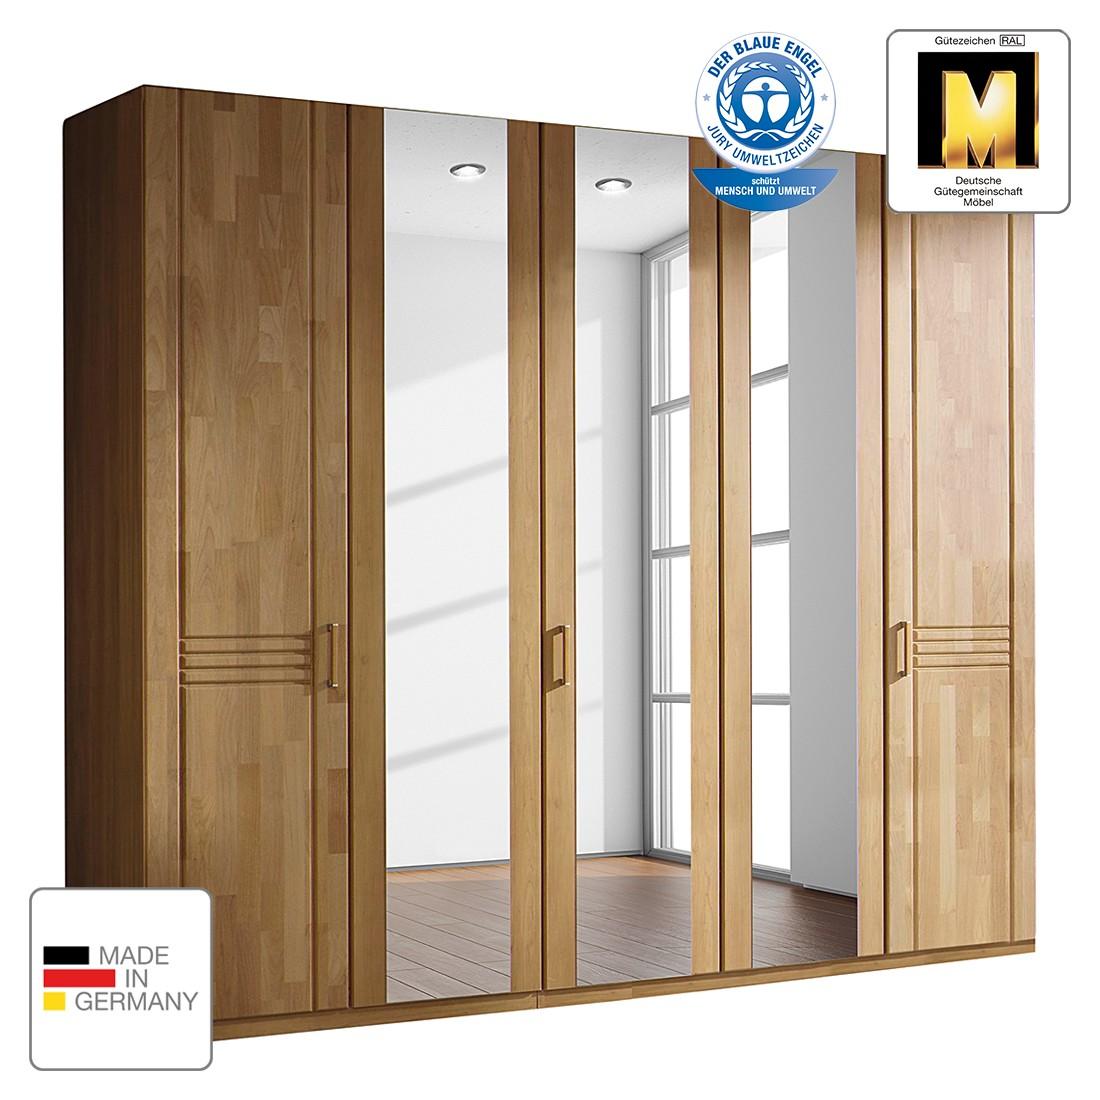 goedkoop Draaideurkast Savina Wild eikenhout 142cm 3 deurs 1 spiegeldeur Zonder Passe partout lijst Rauch Steffen